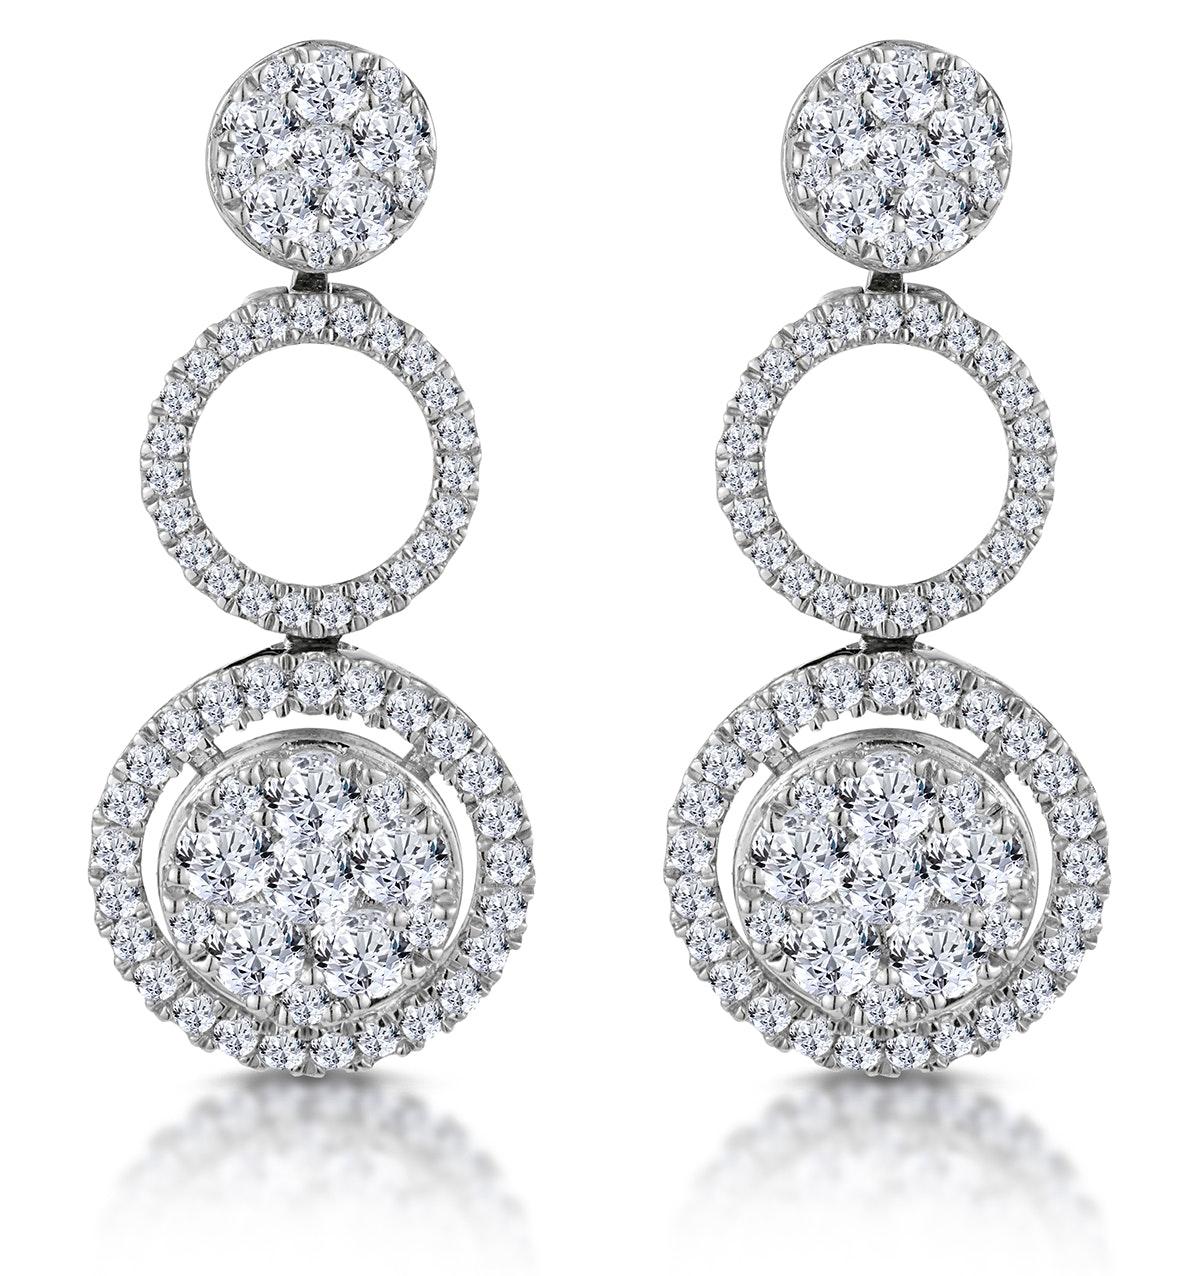 Athena Diamond Circle Multi Wear Earrings 1.3ct Set in 18K White Gold